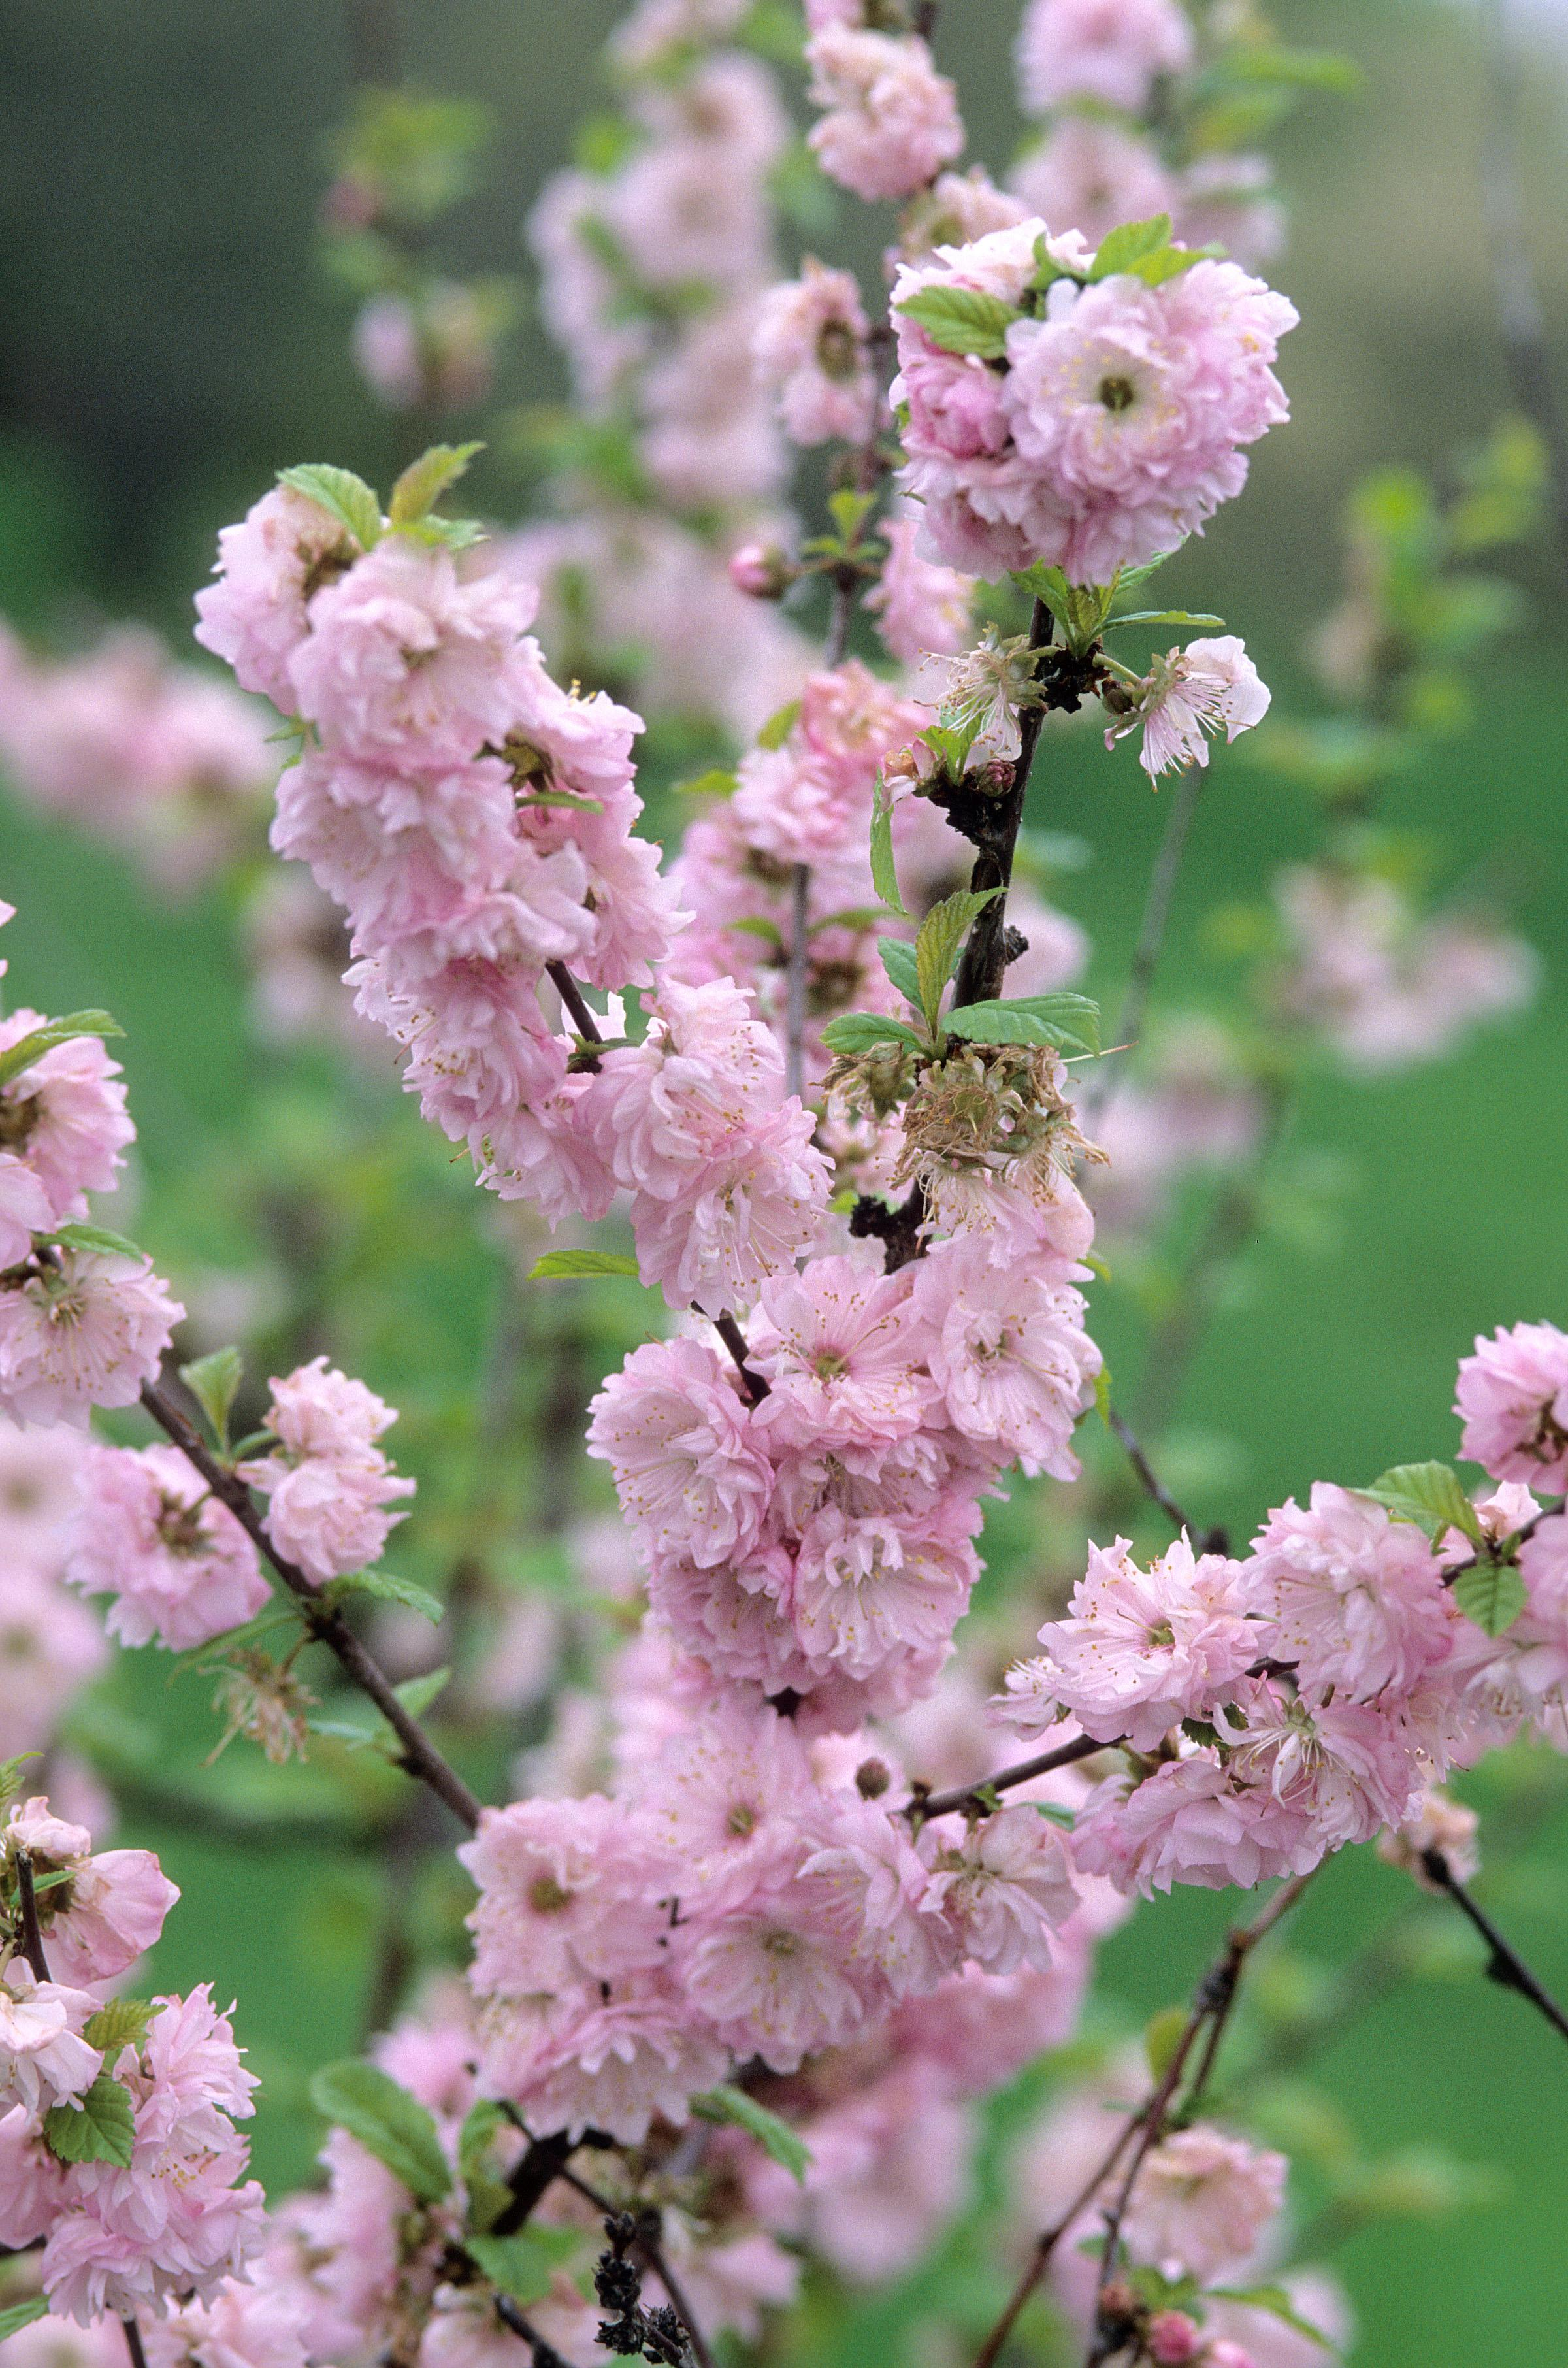 0672-2_PrunustrilobaDblFloweringPlumshrub.jpg.jpg